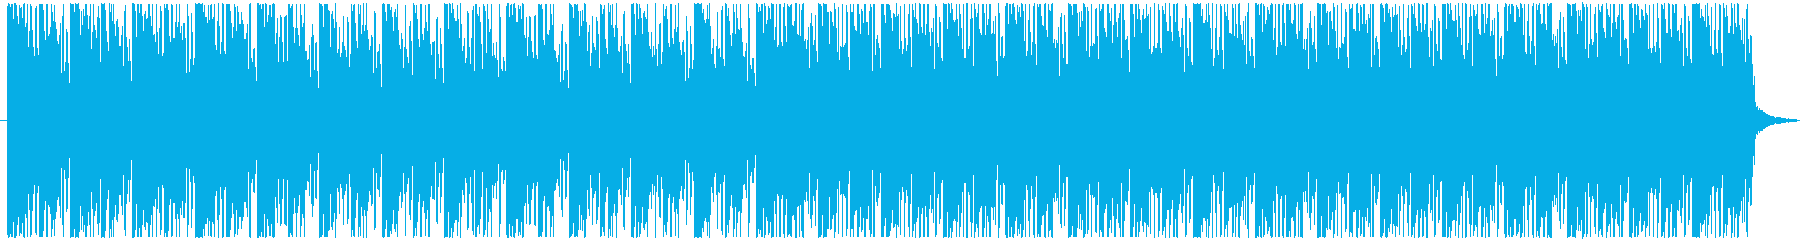 Jungle, power, dynamism_beat & rhythm's reproduced waveform